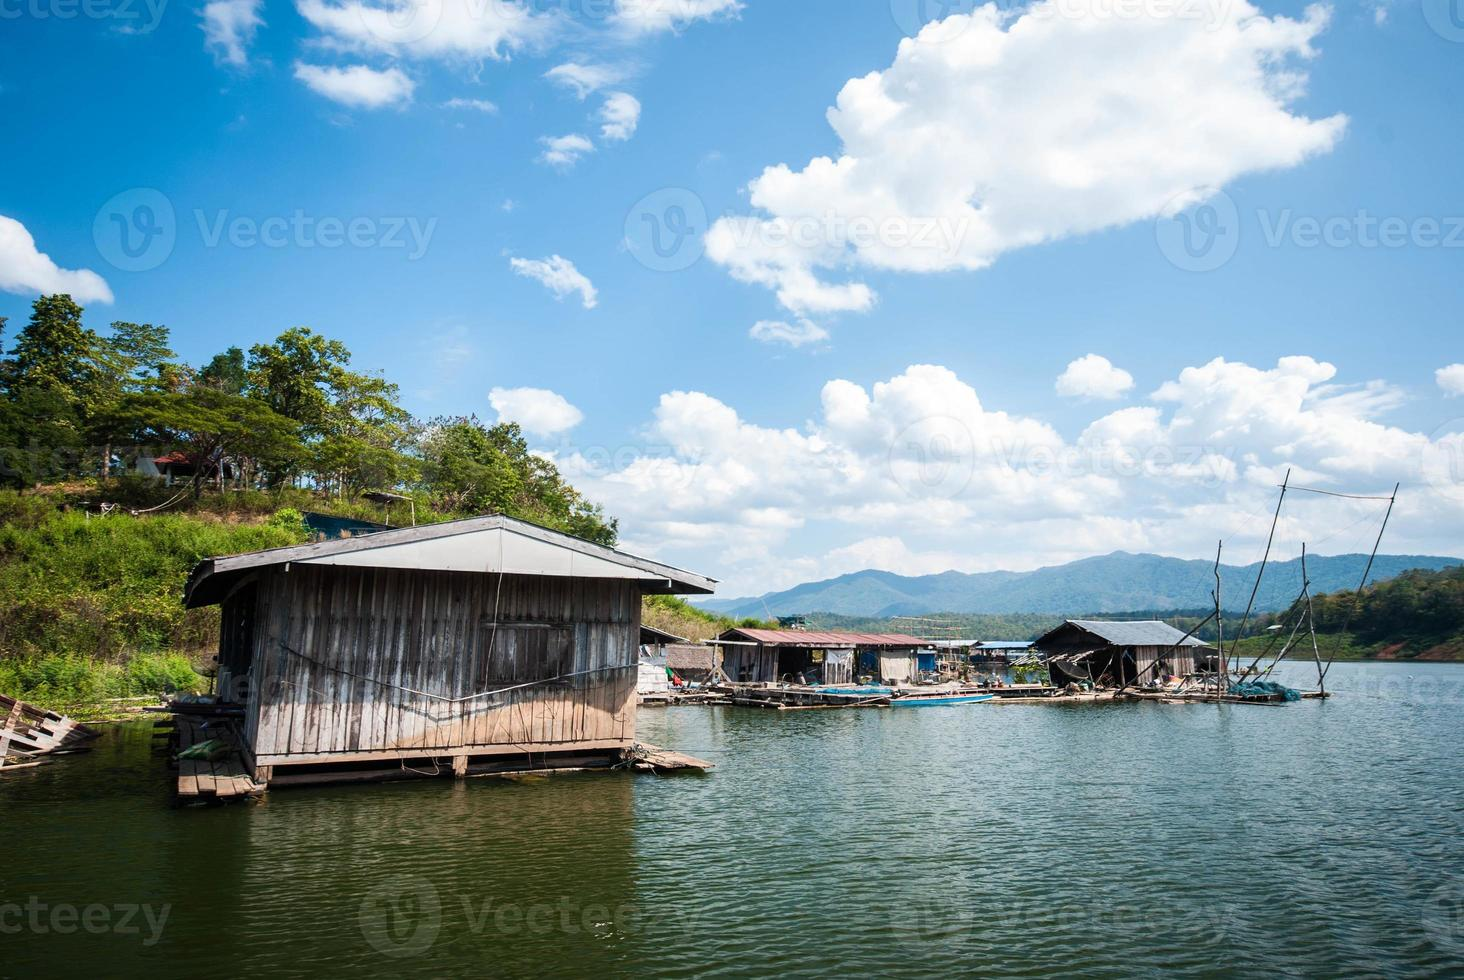 Holzhaus am Fluss in Thailand foto